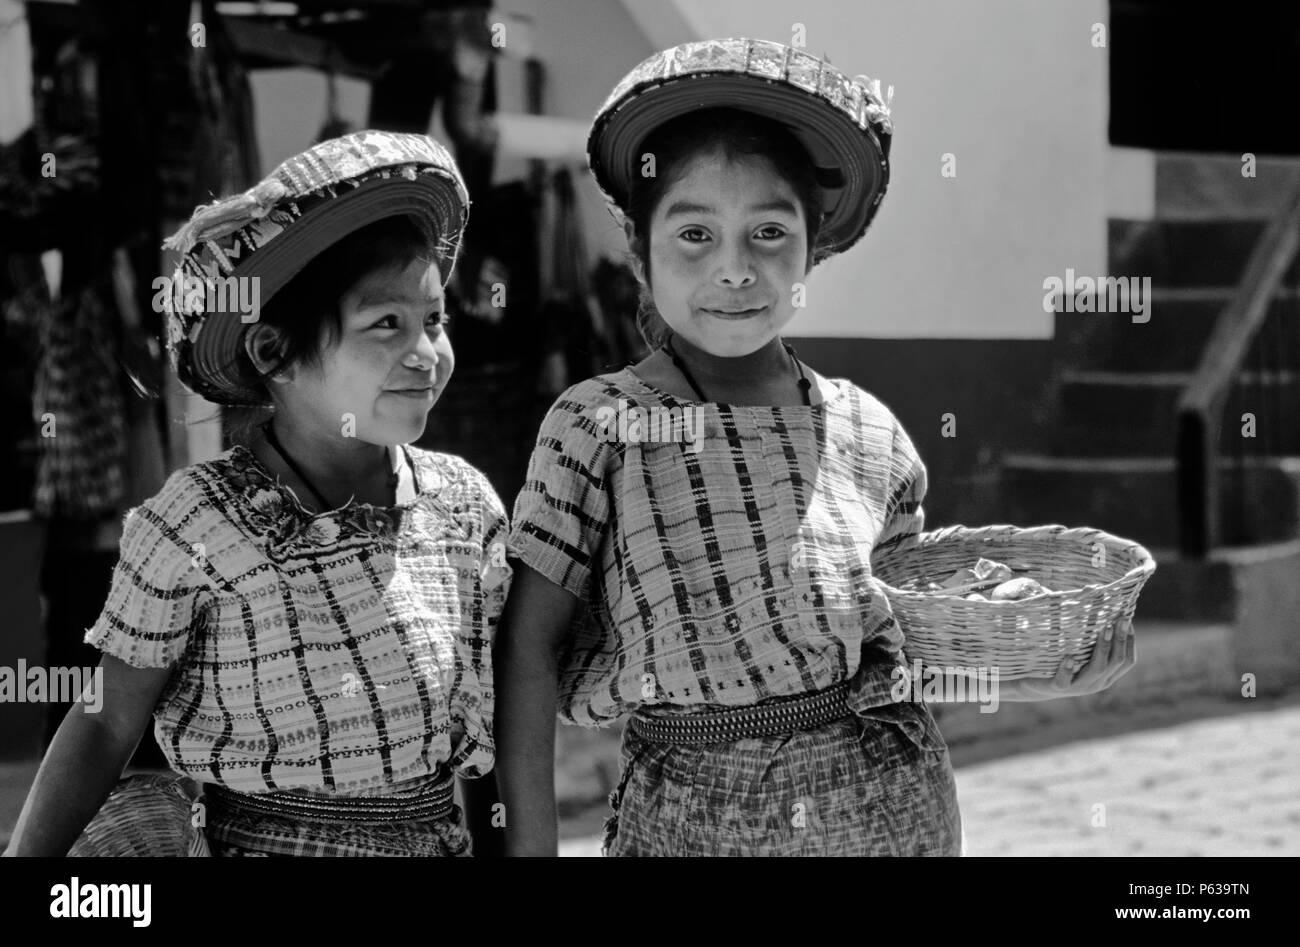 TZUTUJIL GIRLS in traditional handmade HUIPILS (blouses) and TOCAYALS (headresses) - SANTIAGO ATITLAN, GUATEMALA - Stock Image